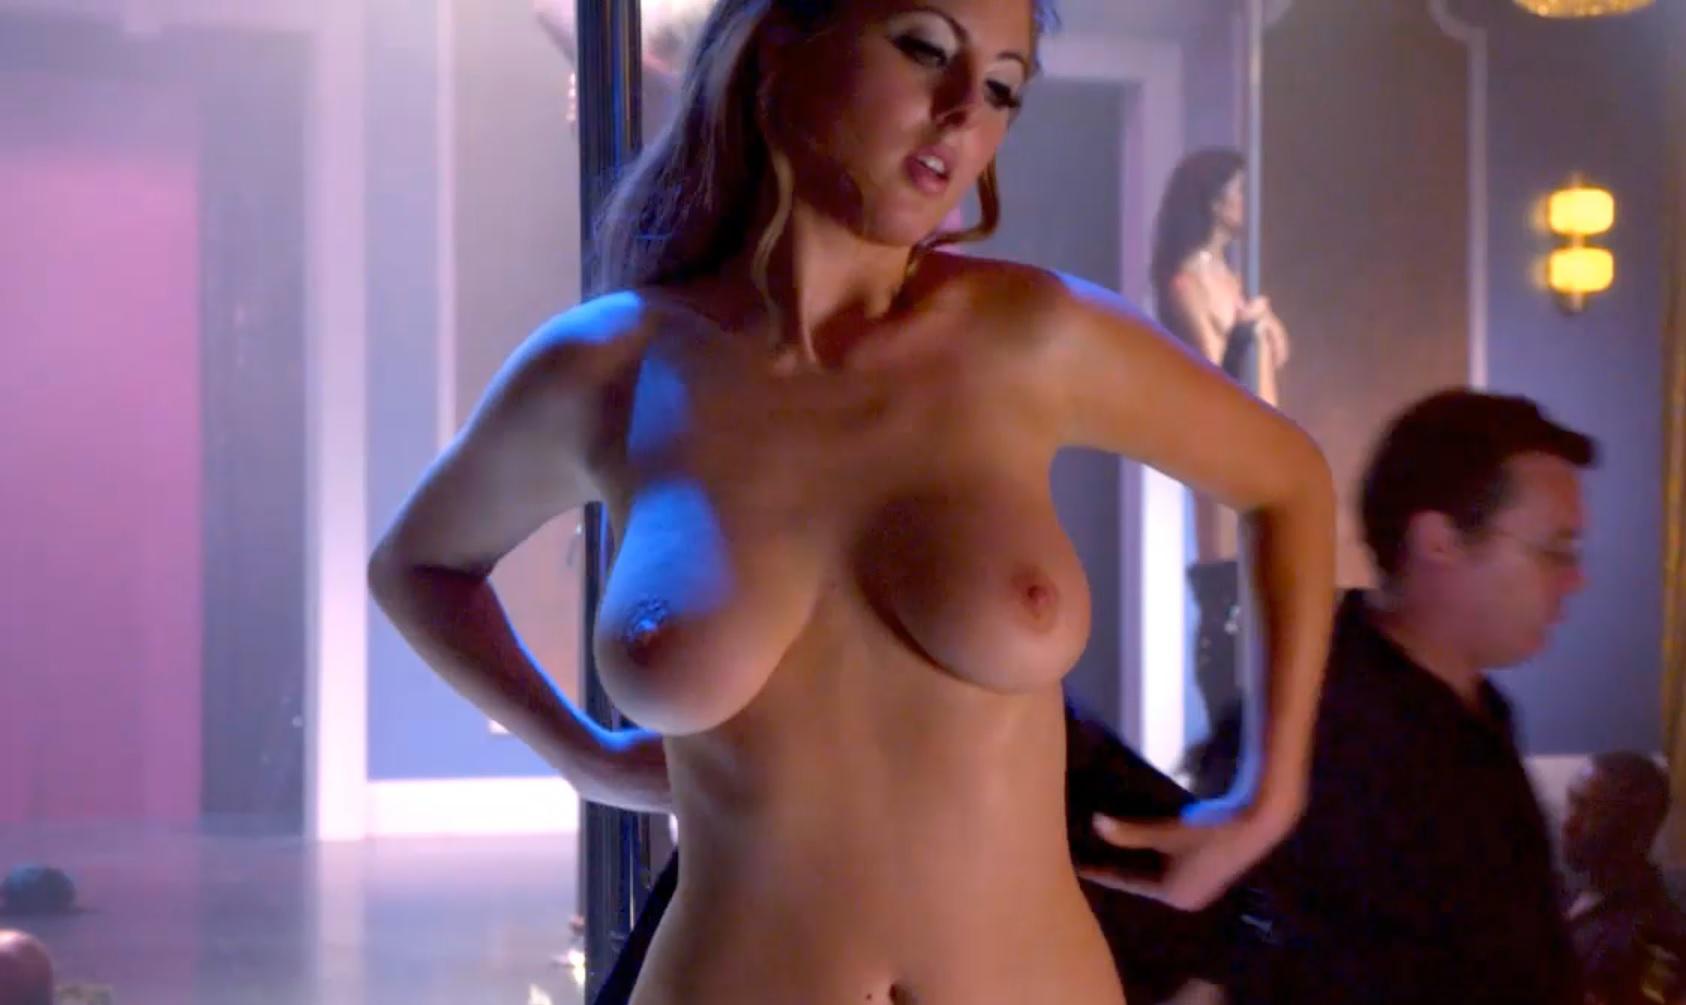 Film Porno Eva eva amurri nude scene in californication series - free video